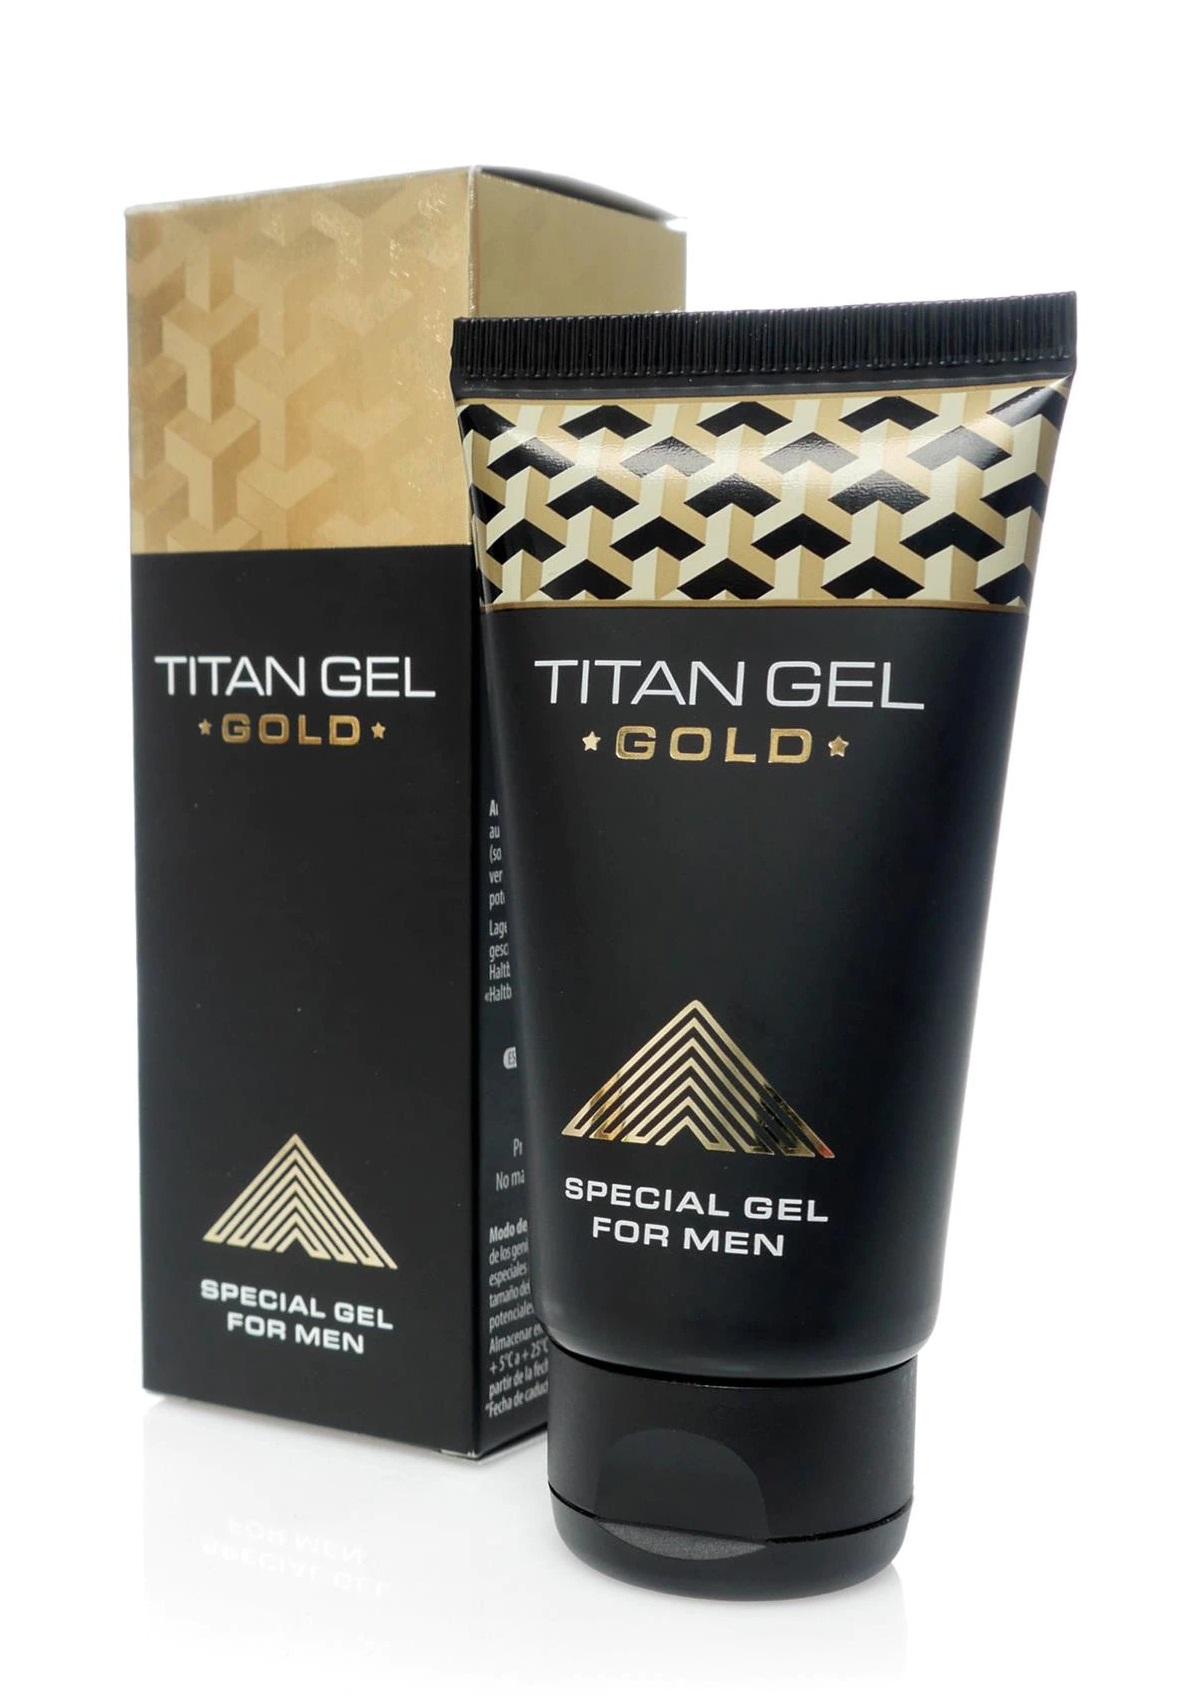 Titan GEL GOLD.